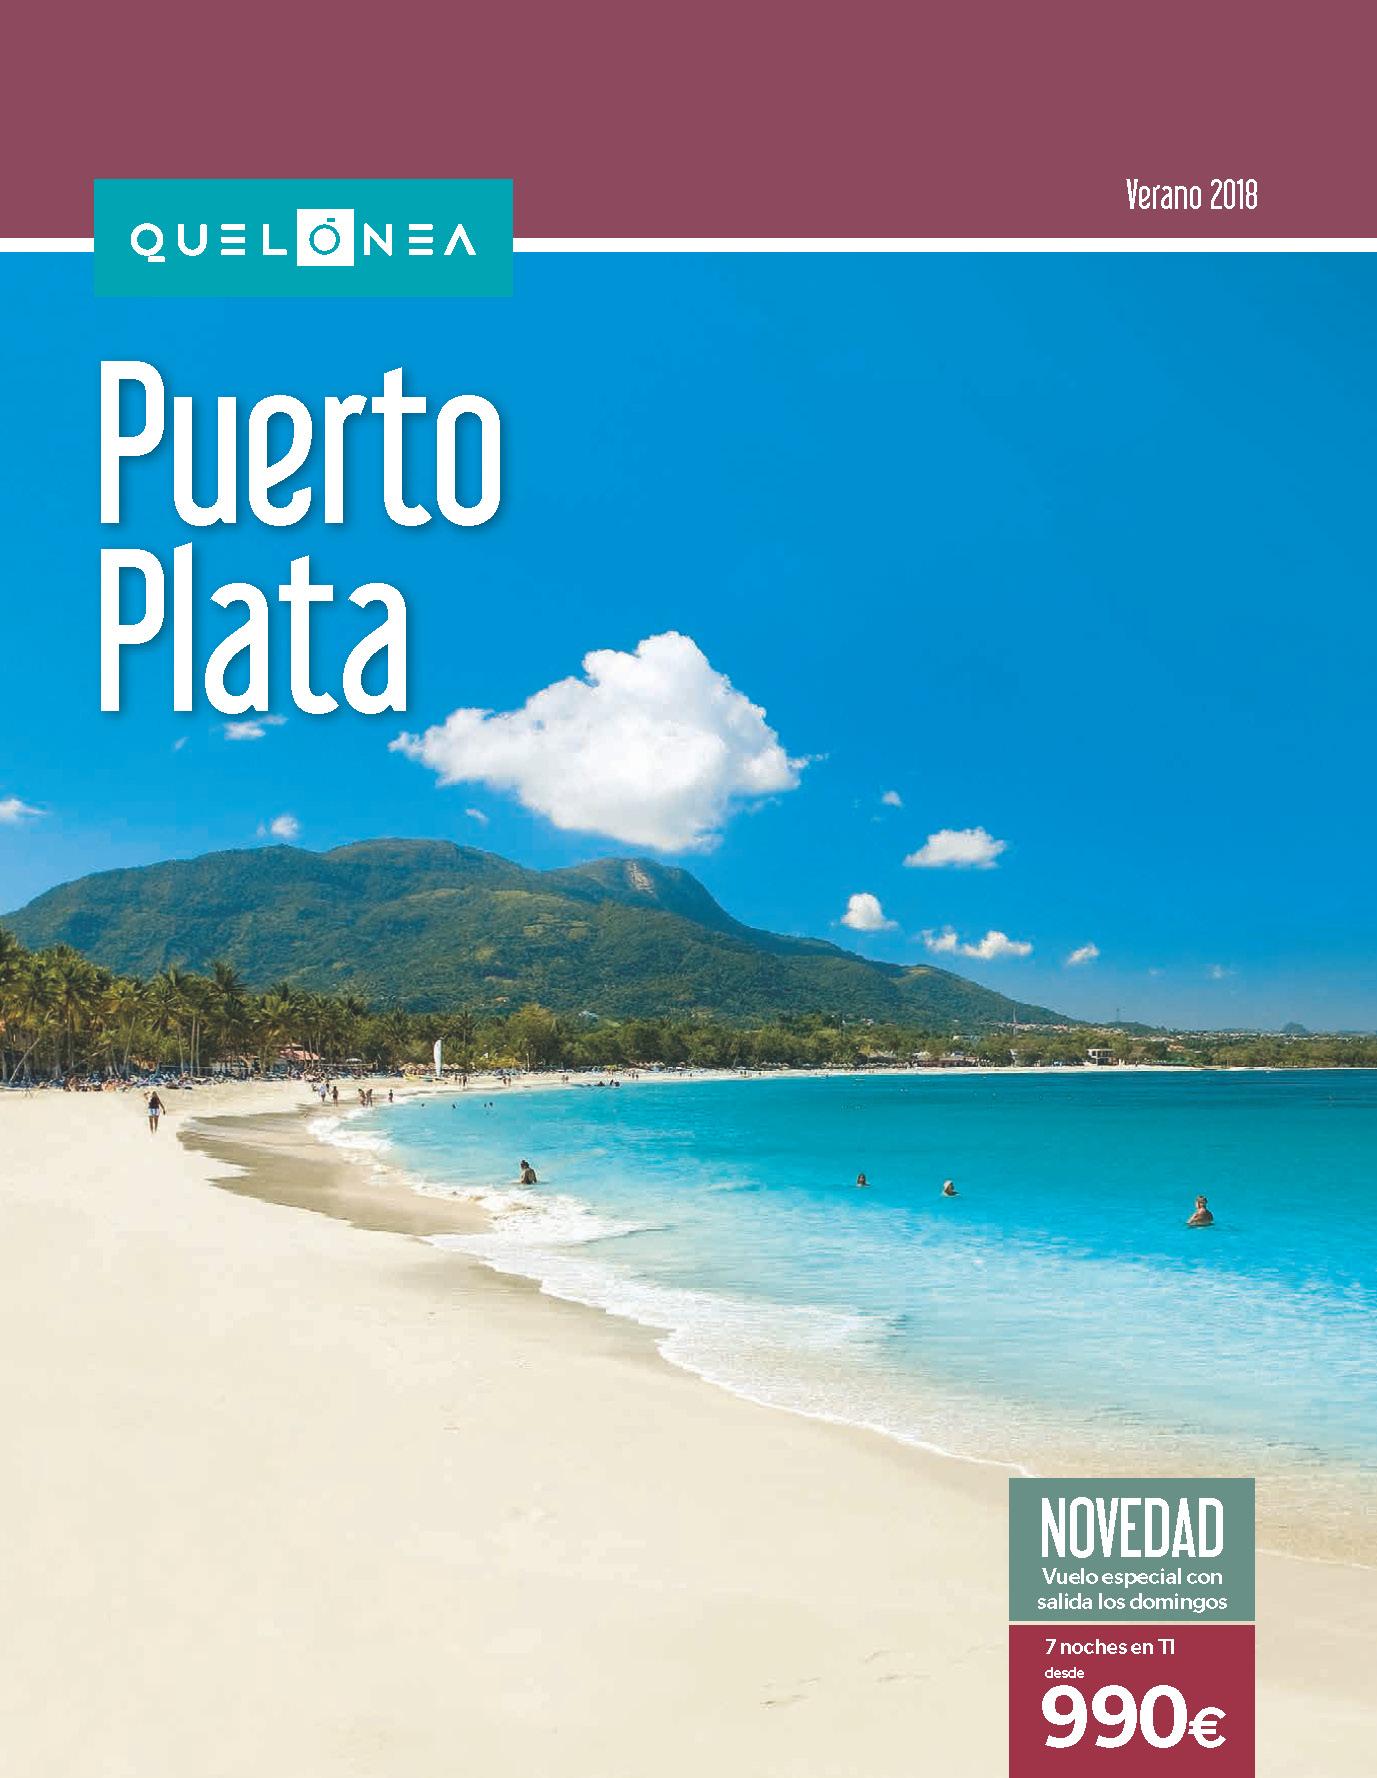 Catalogo Quelonea Puerto Plata verano 2018